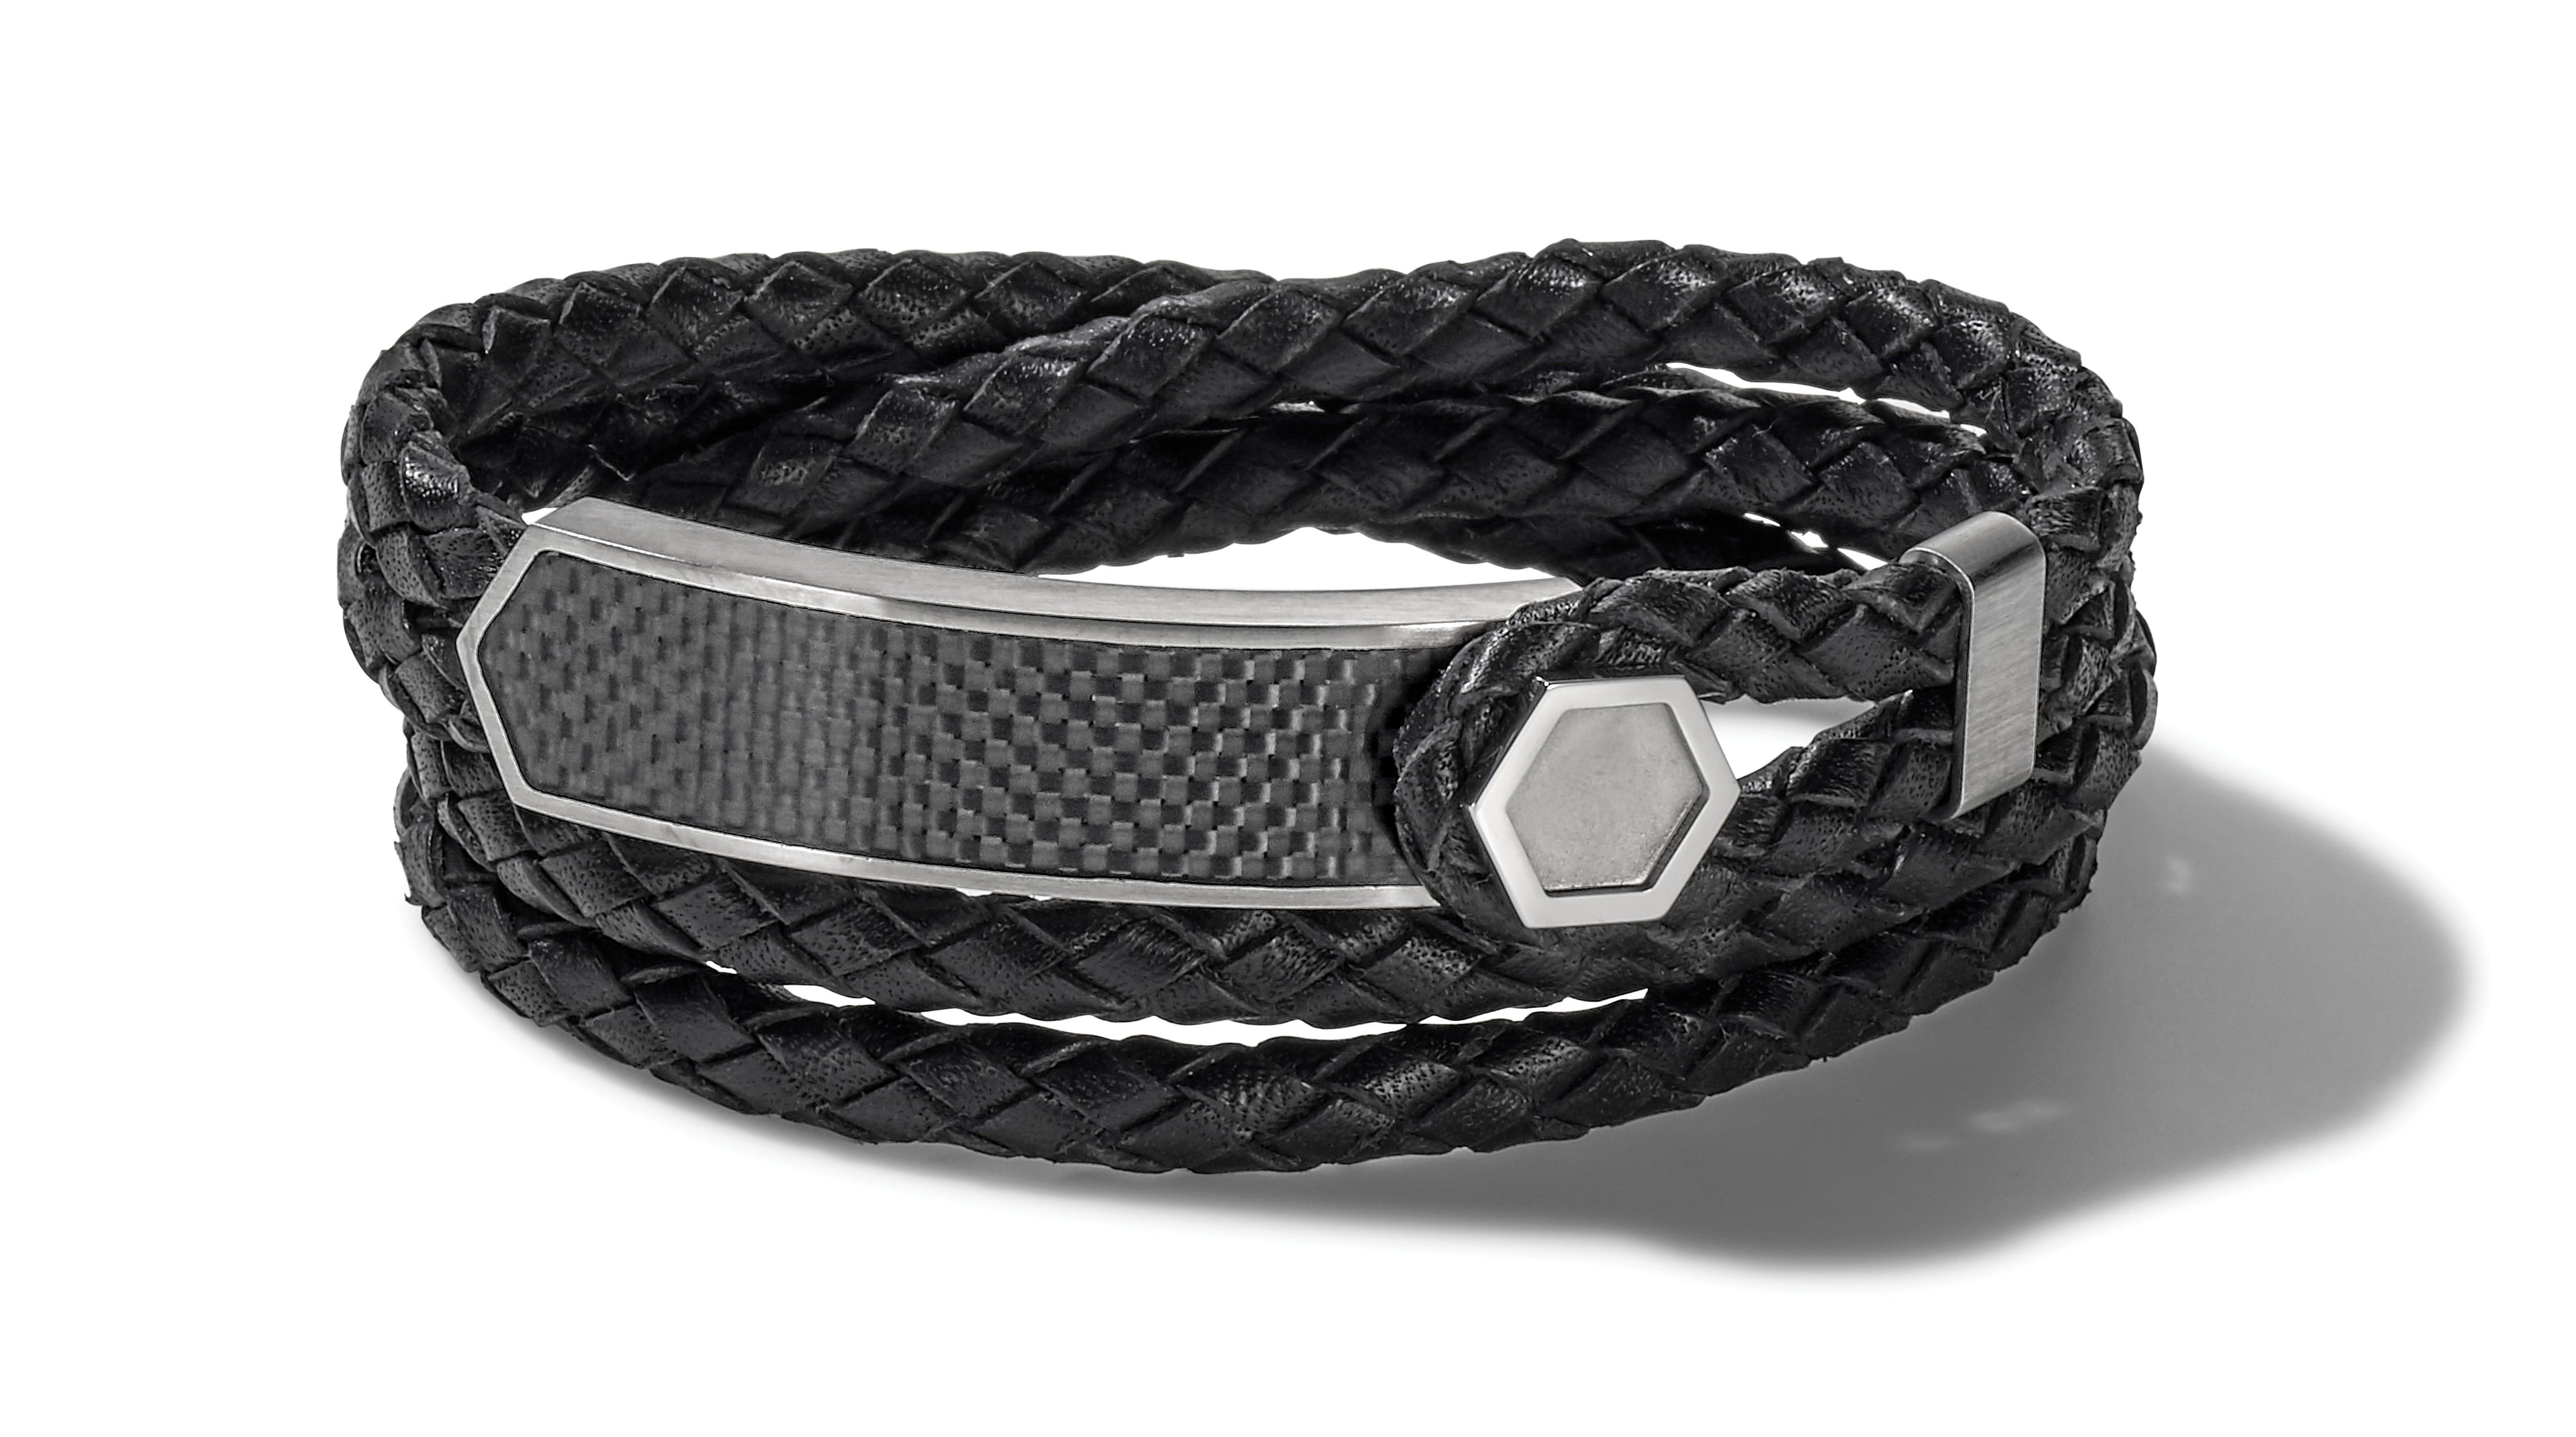 Bulova Precisionist Black Leather Bracelet J96B008L